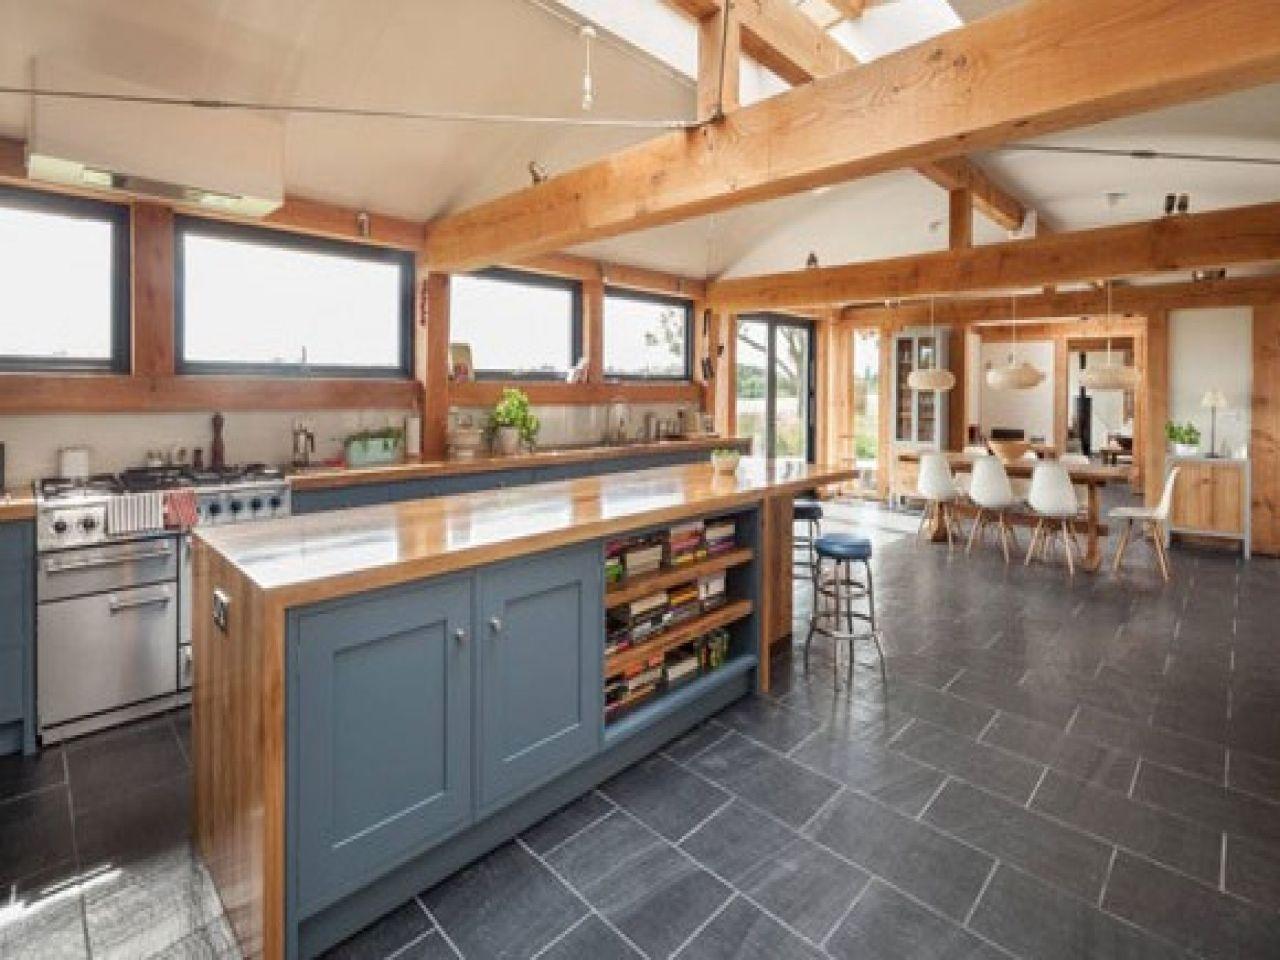 Metal Building Homes Inside | farmhouse kitchen island, Kitchens ...